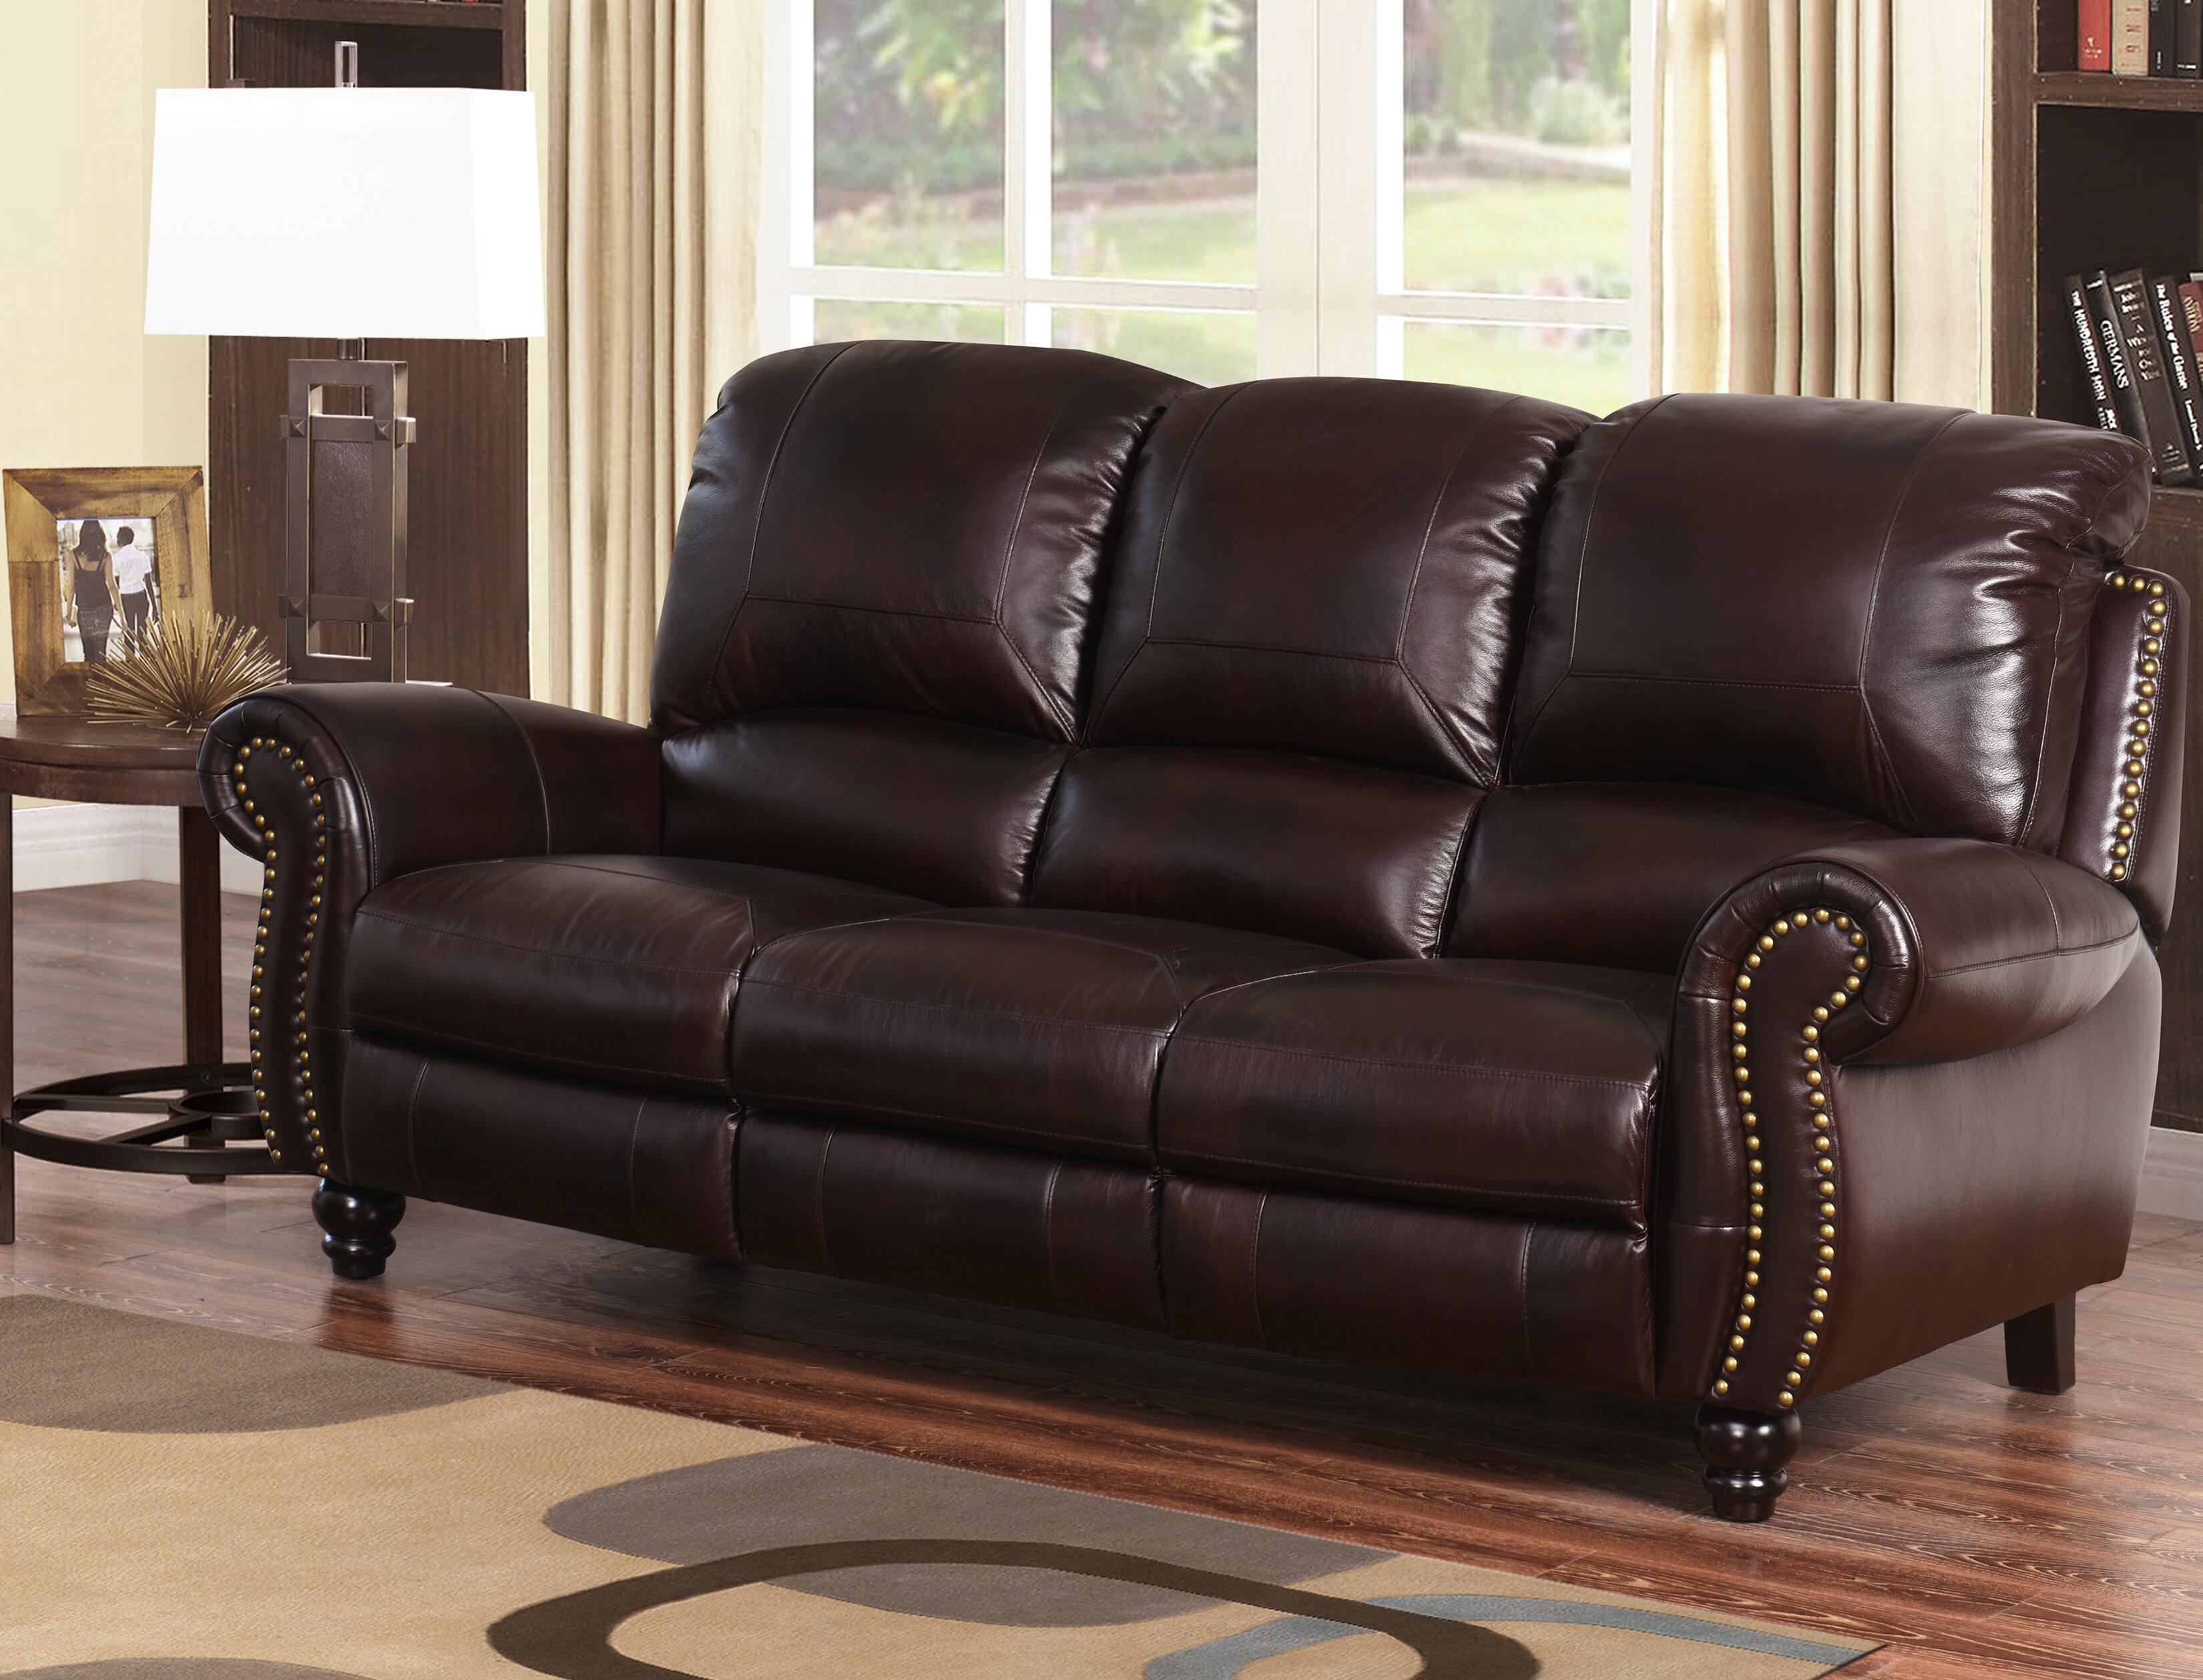 Peachy Tanguay Leather Reclining Sofa Short Links Chair Design For Home Short Linksinfo